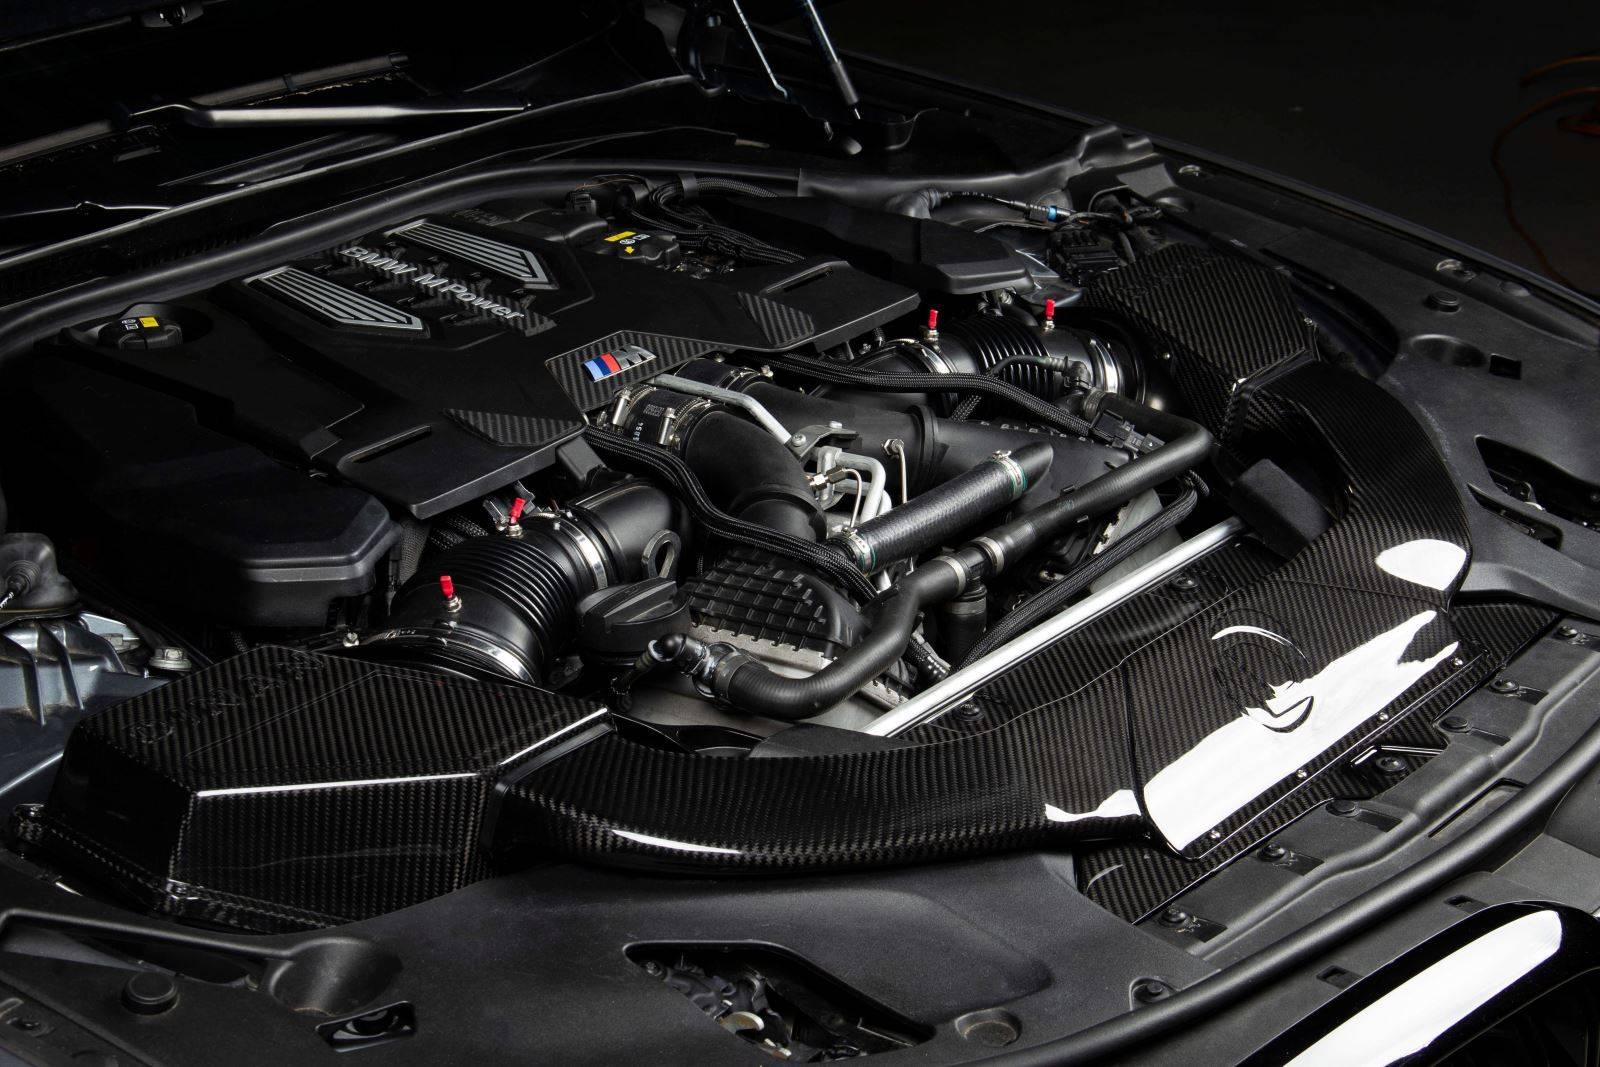 Карбоновый впуск Dinan BMW M5 F90